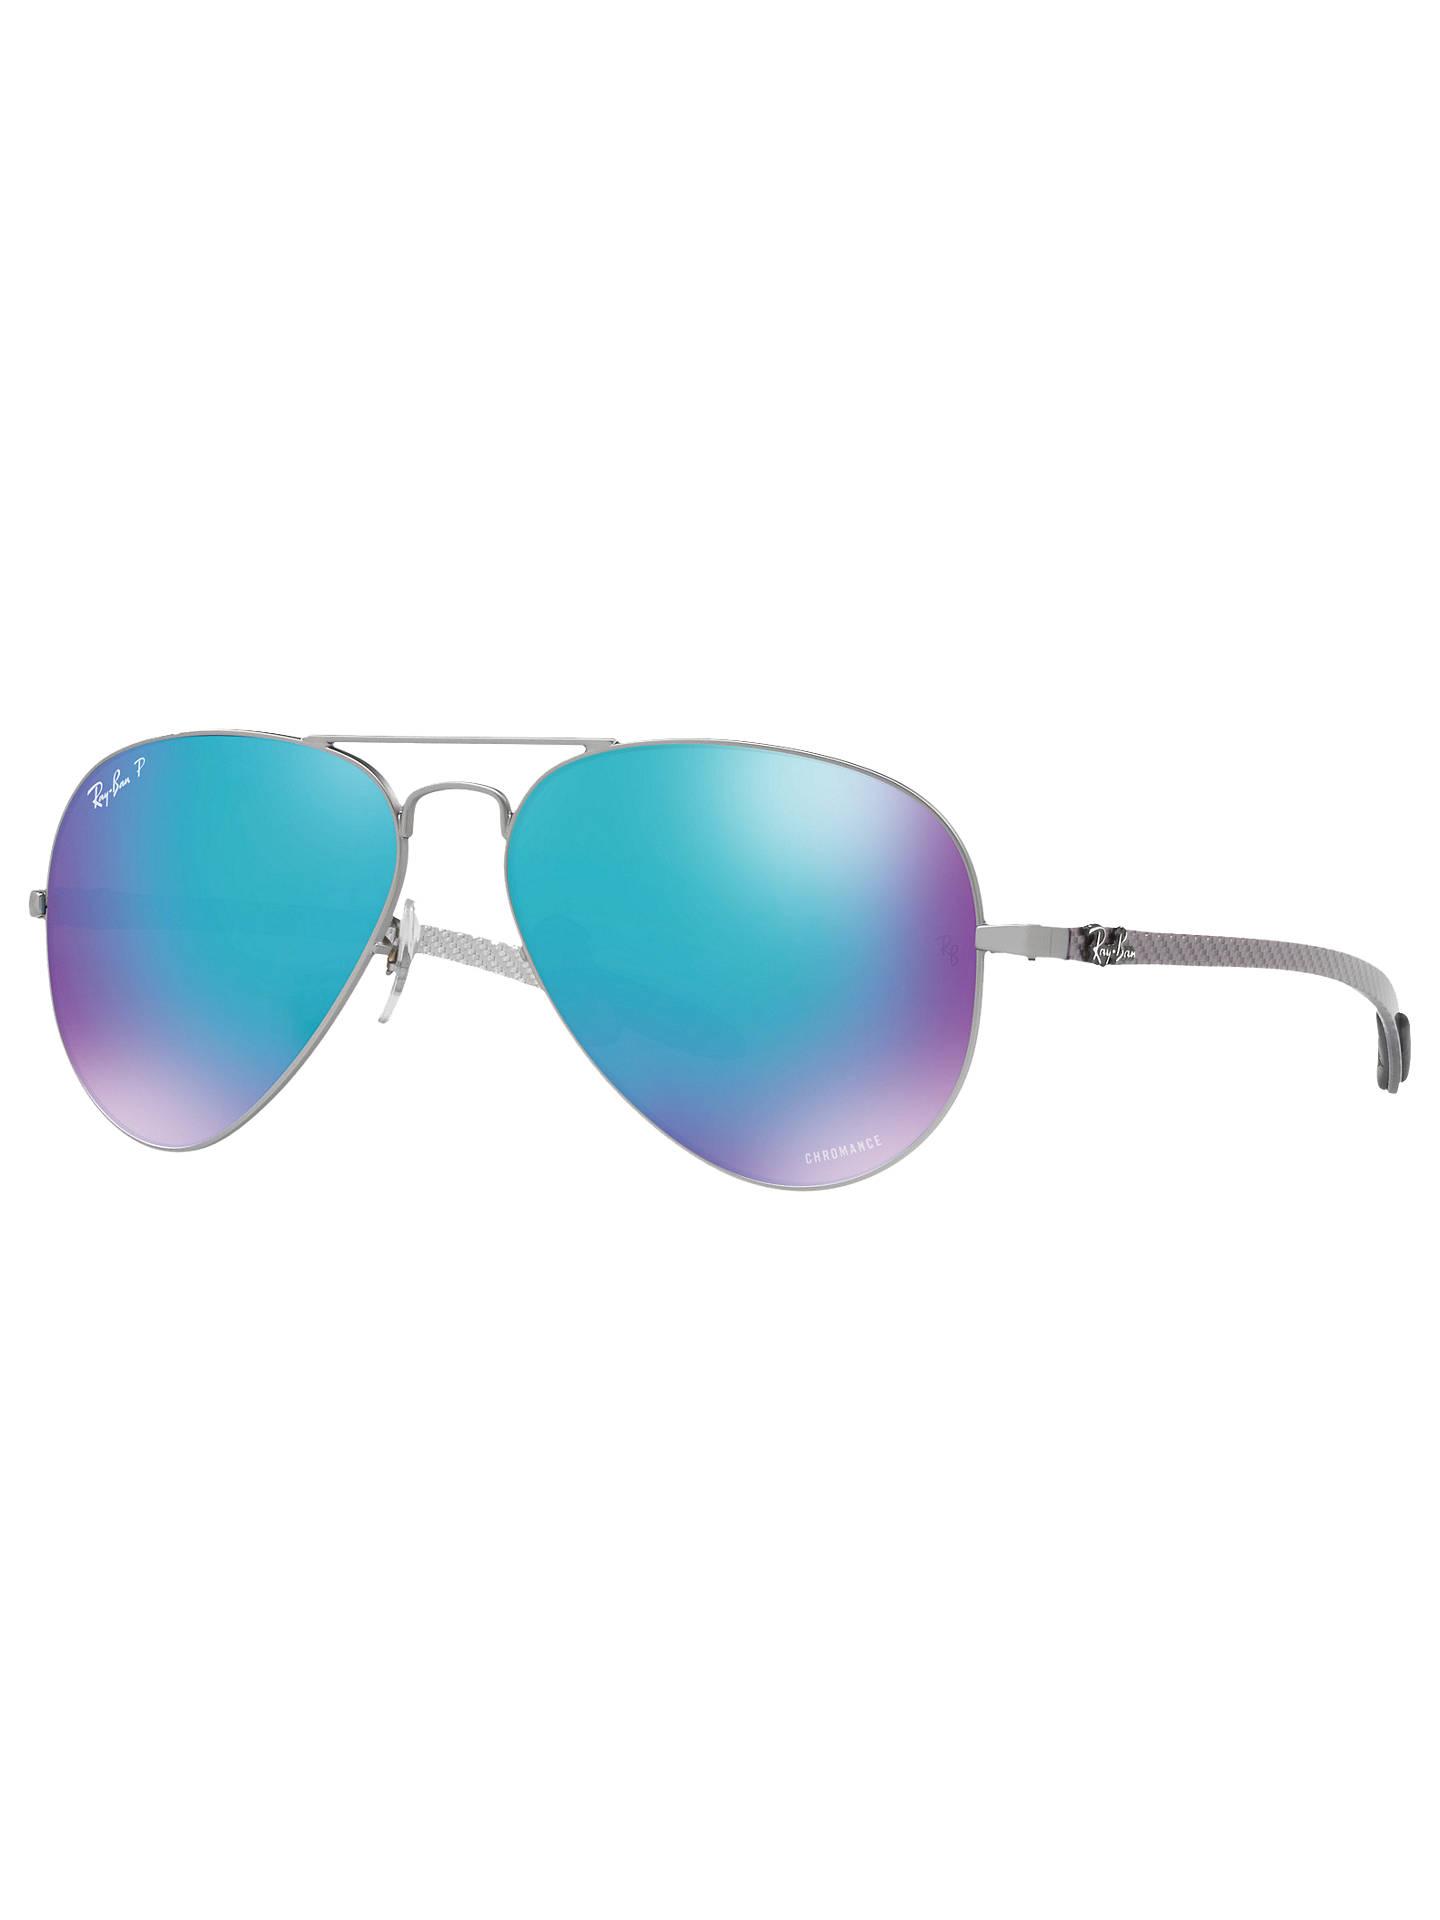 3be638847d9 Ray-Ban RB8317CH Chromance Polarised Aviator Sunglasses at John ...